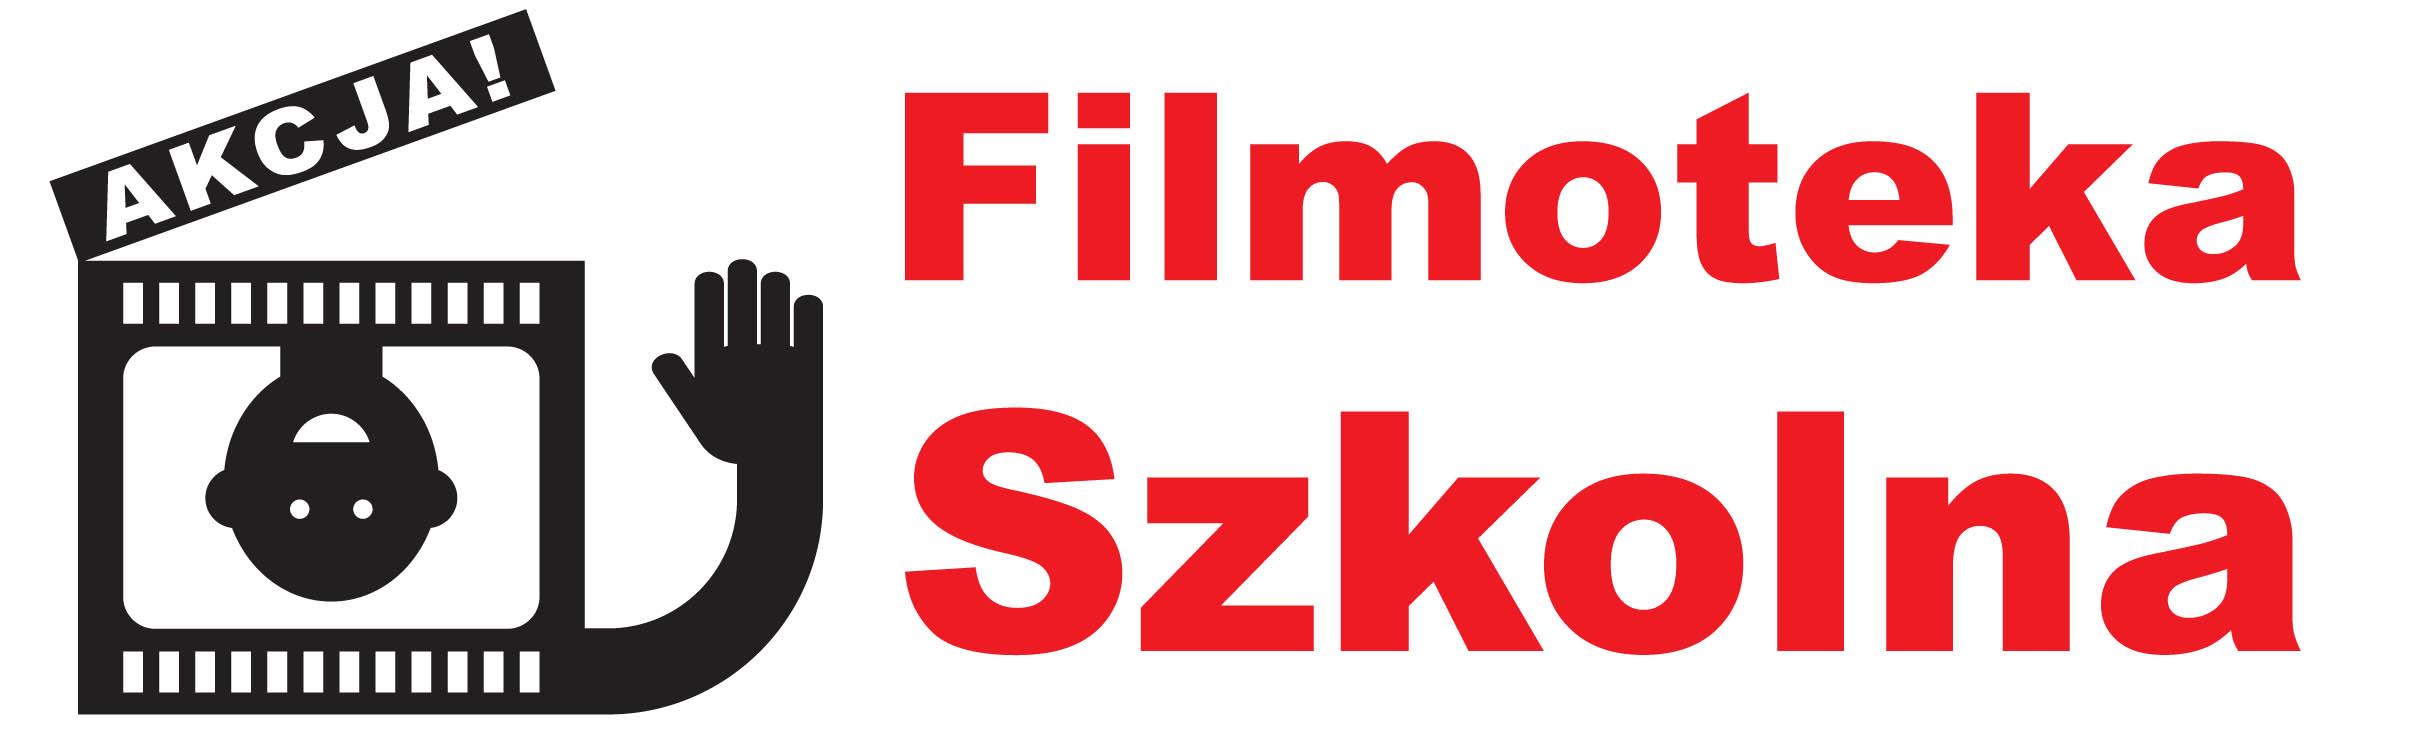 Filmoteka Szkolna